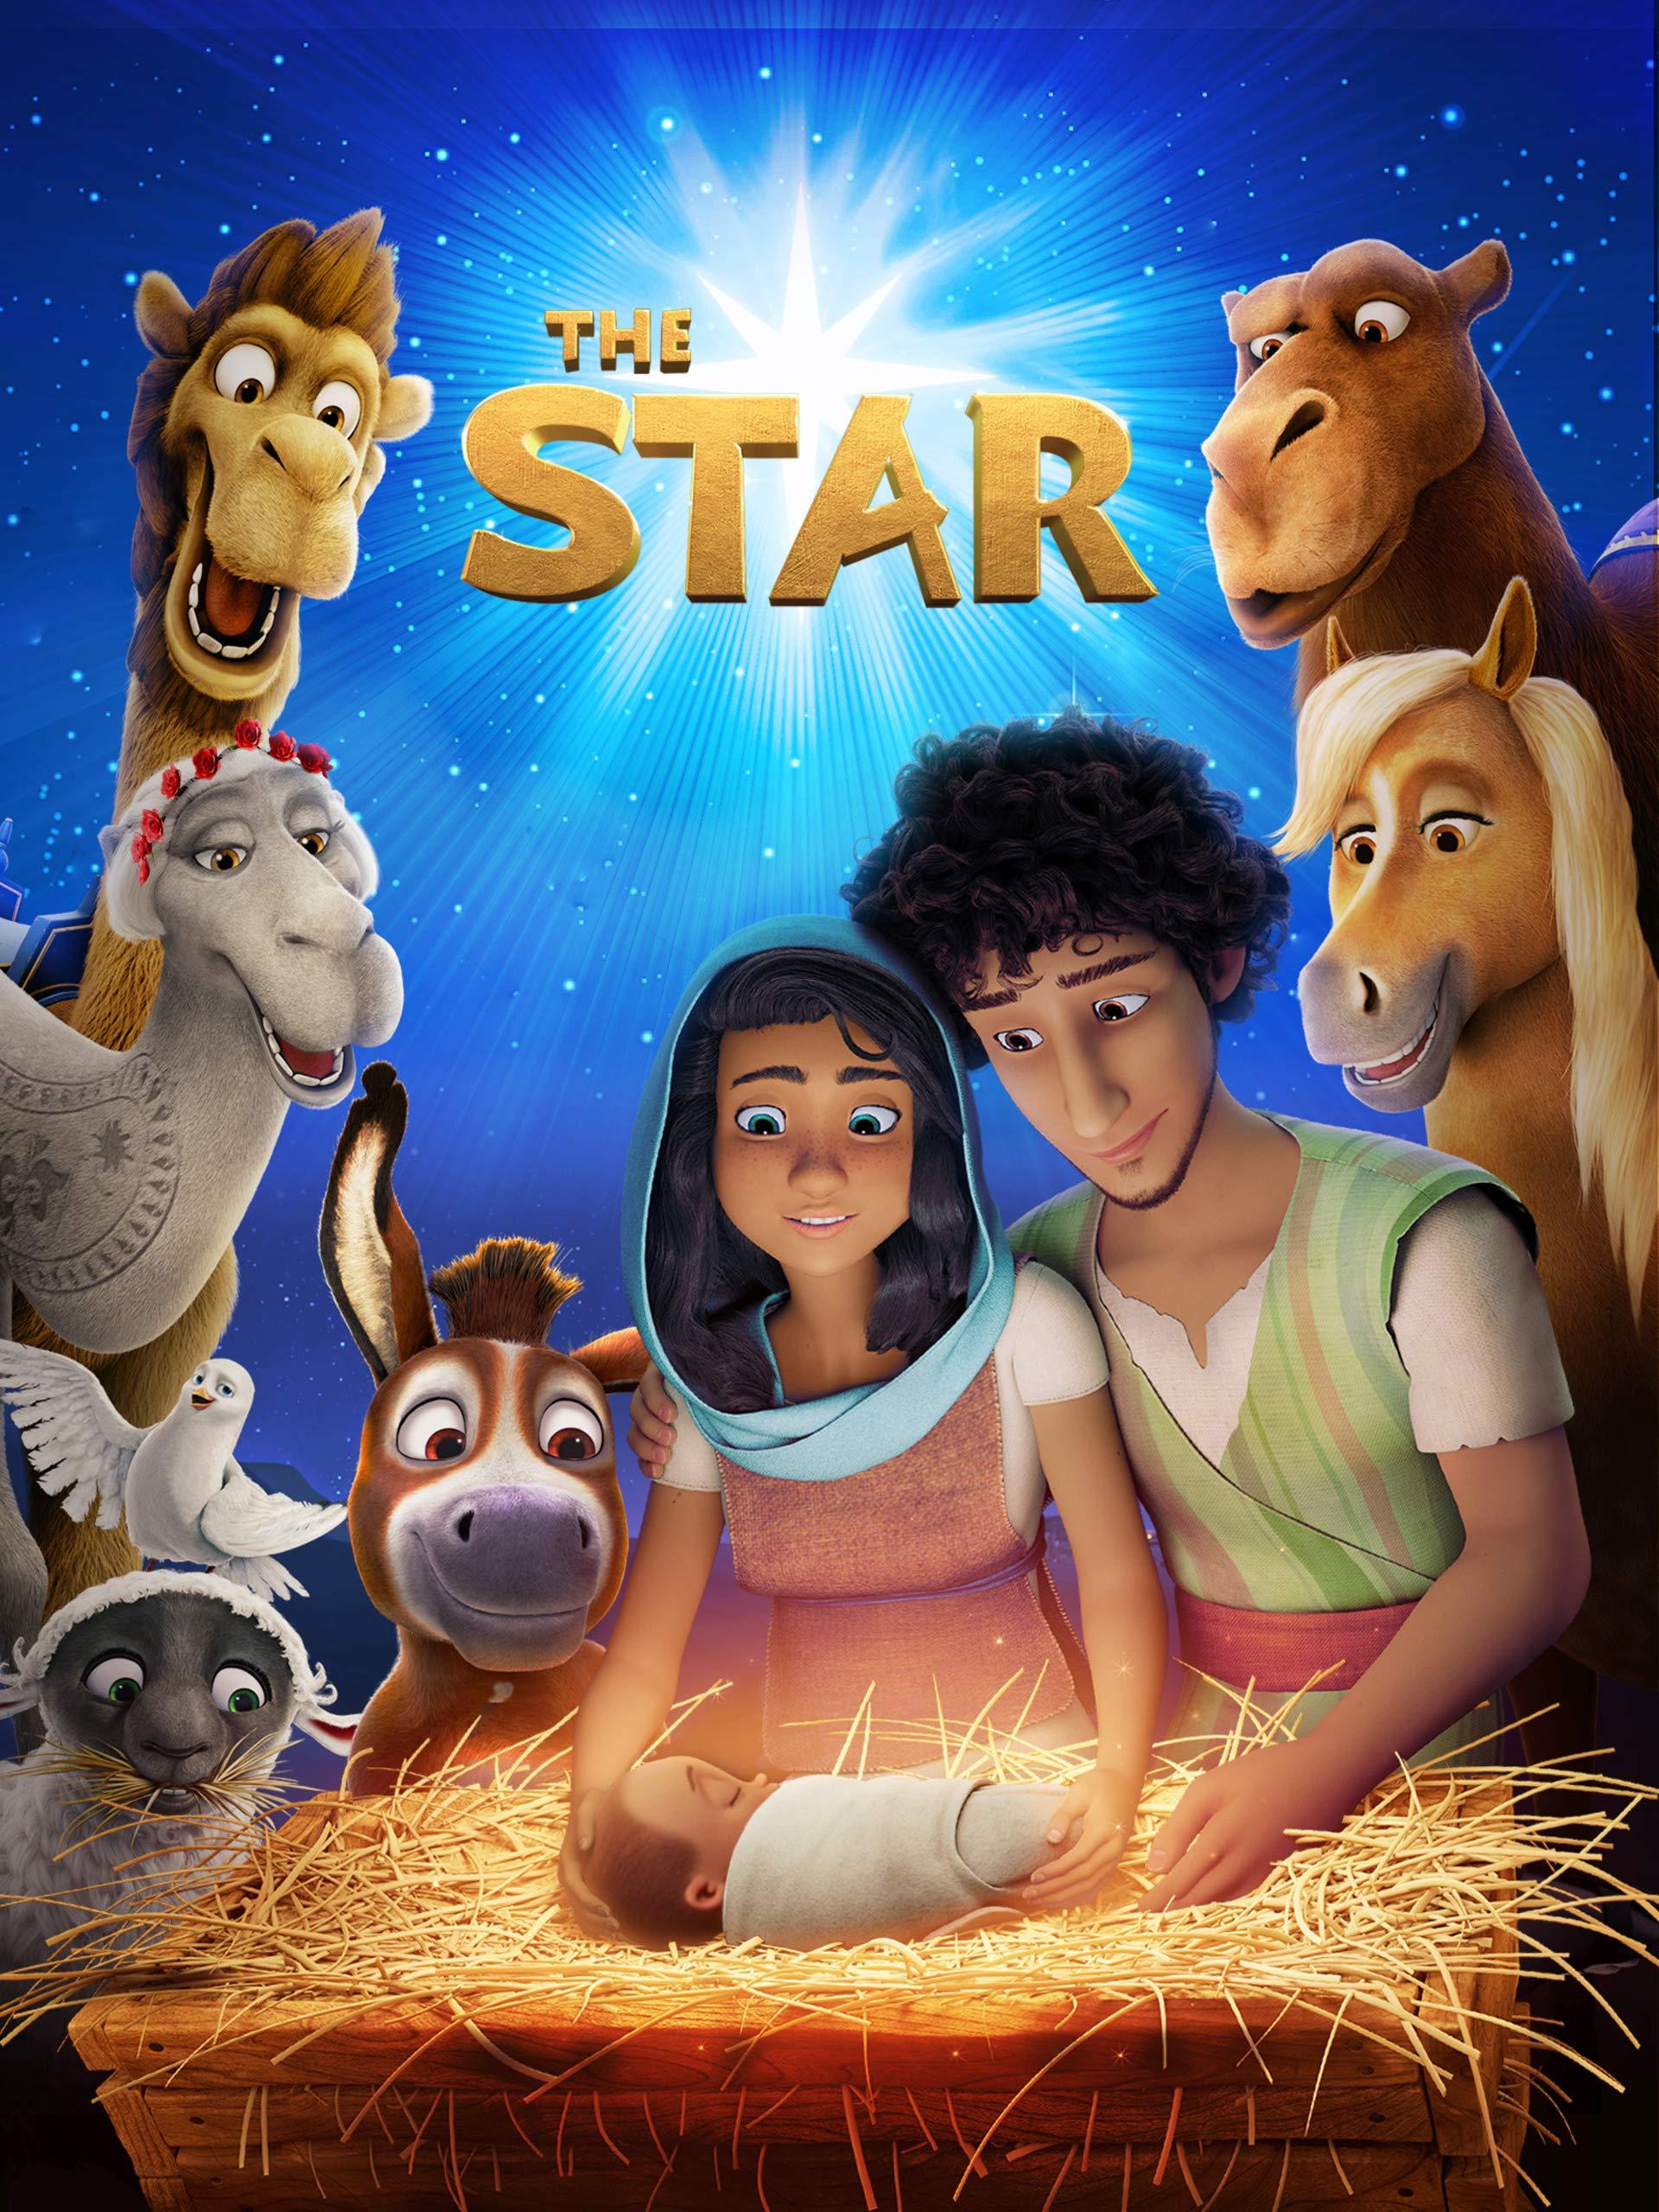 The Star (4K UHD)